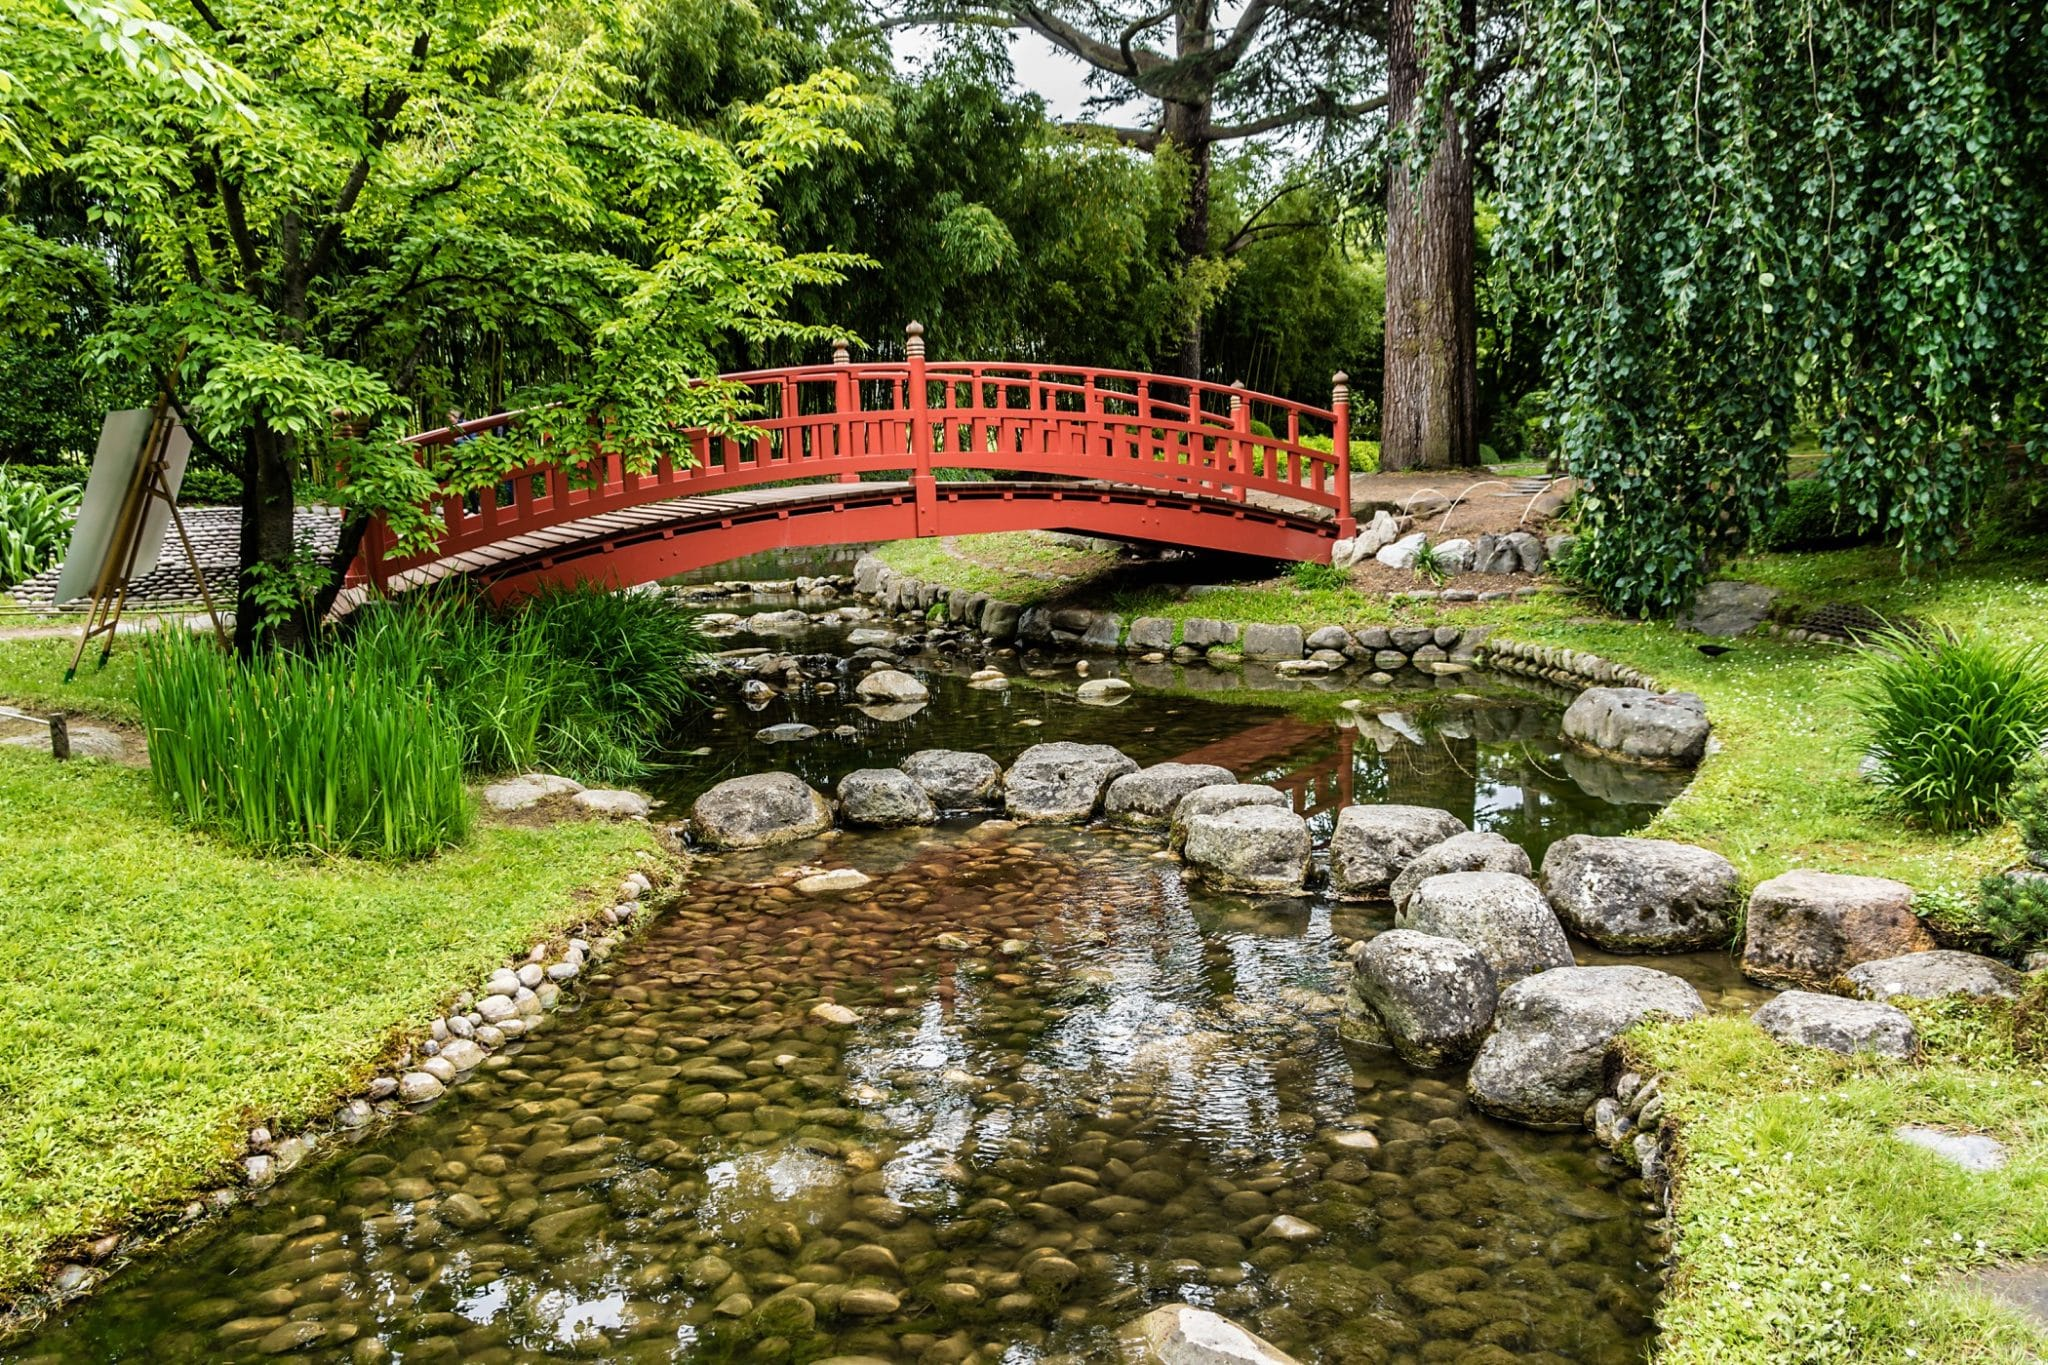 jardins japonais albert kahn paris boulogne musée balade nature